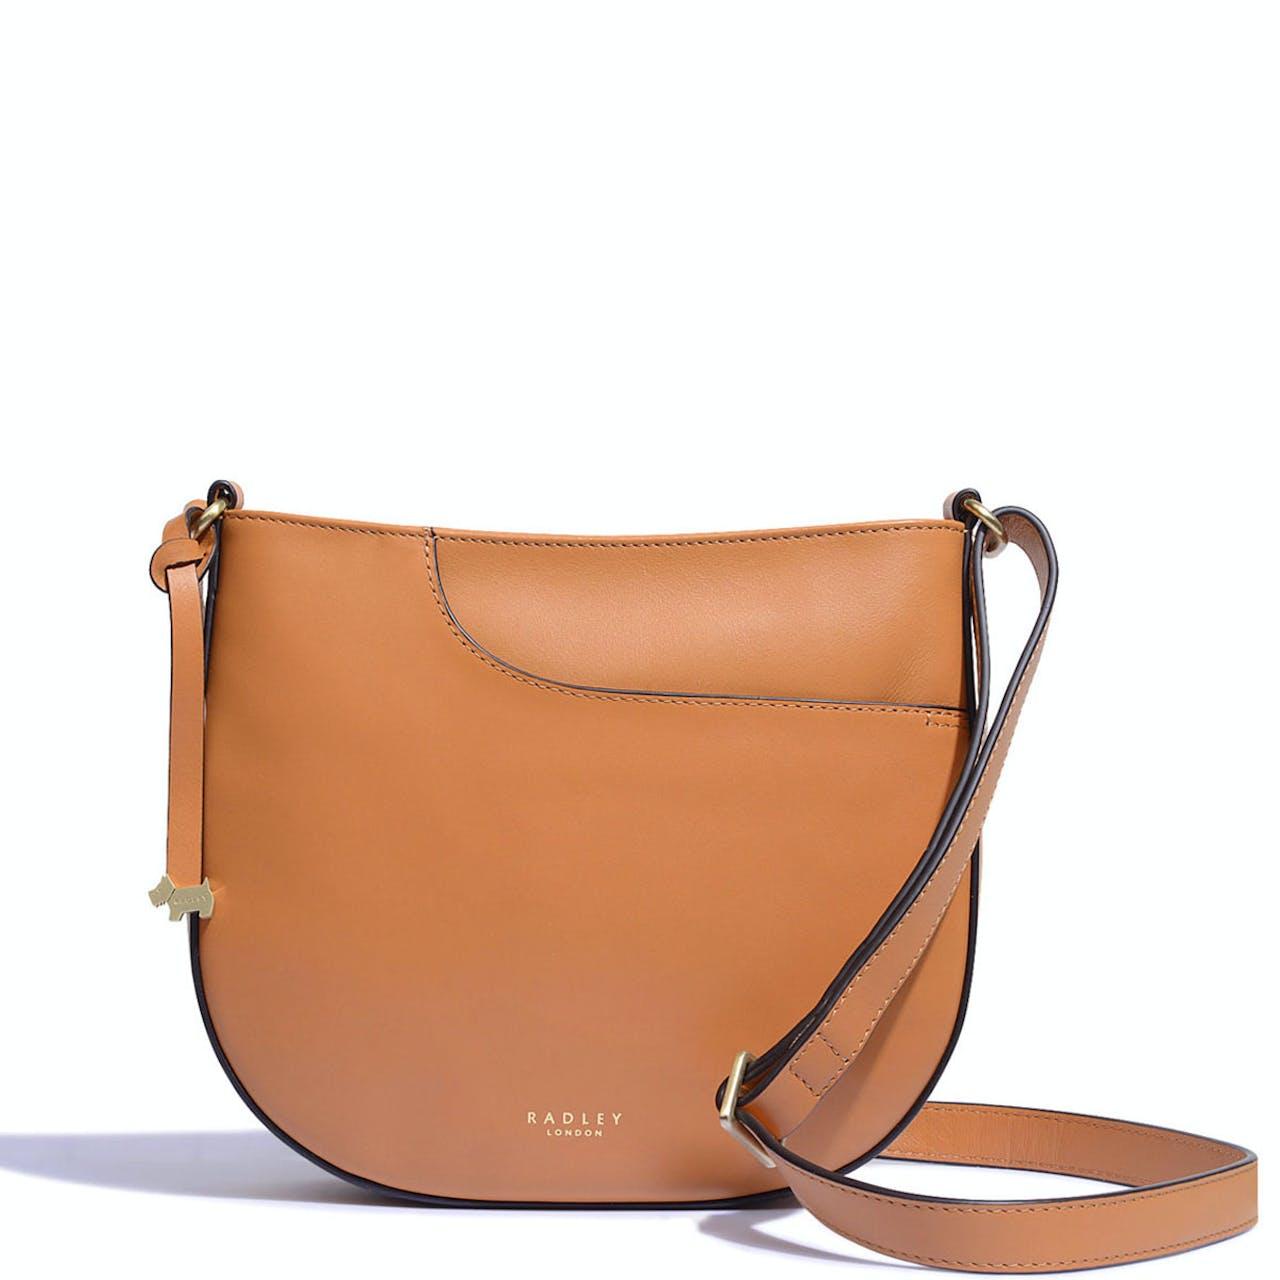 Radley London Pockets Medium Zip-Top Cross Body Bag Dark Butter